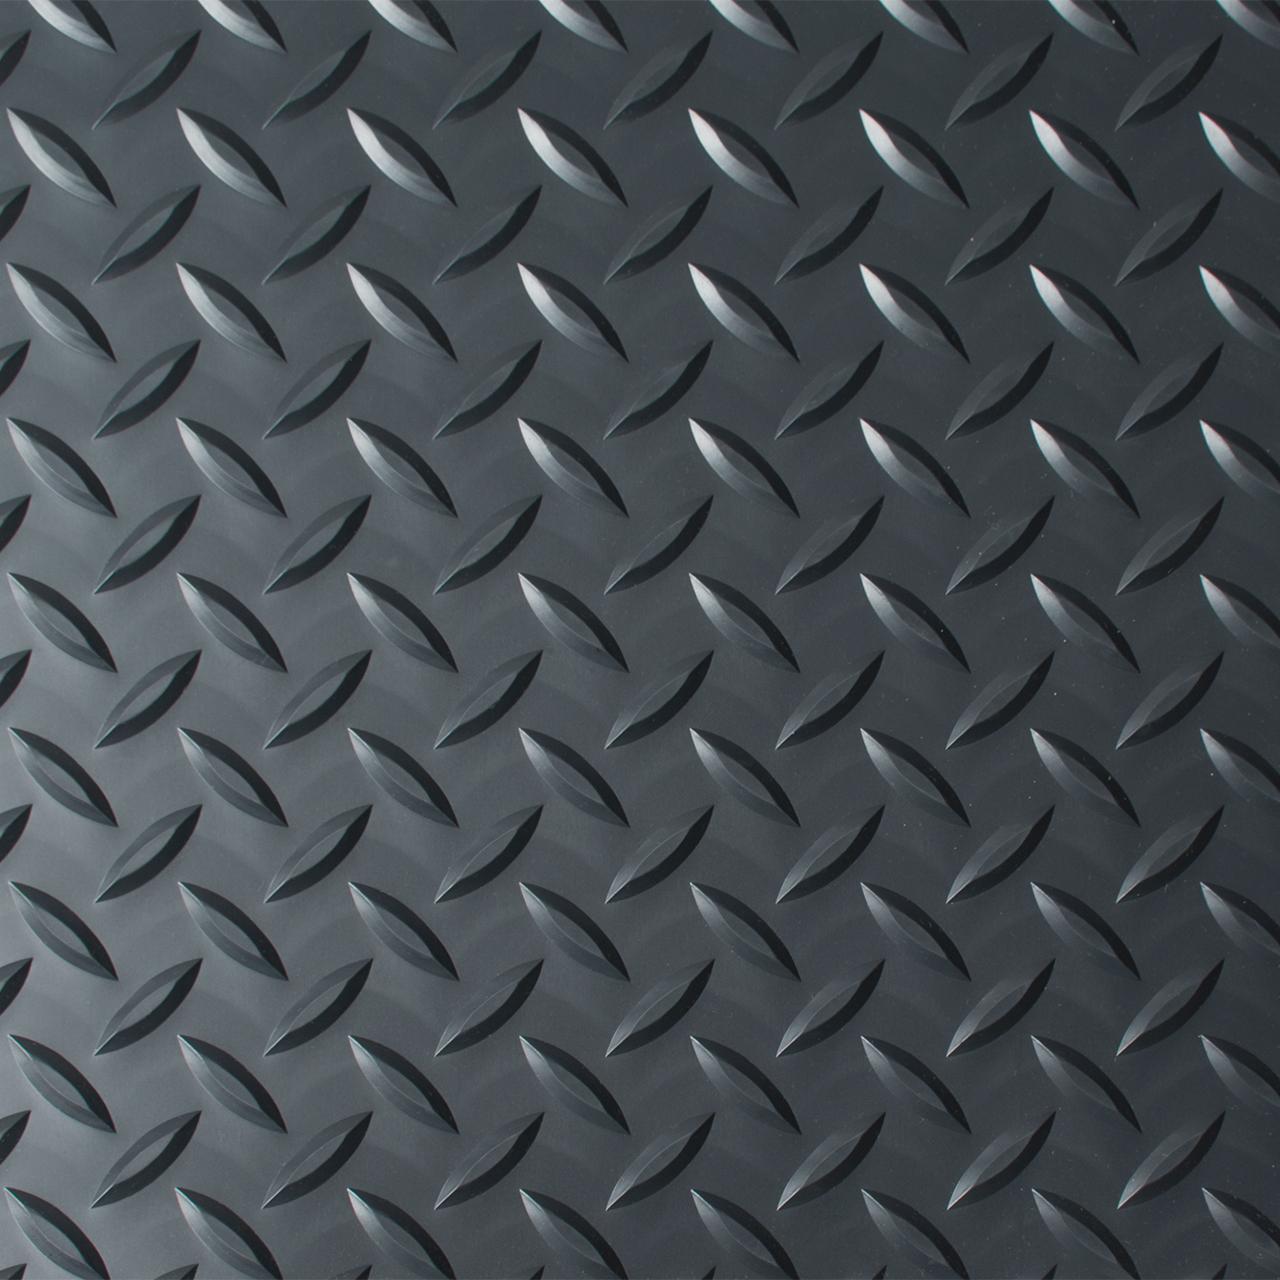 Deckplate Matting Black